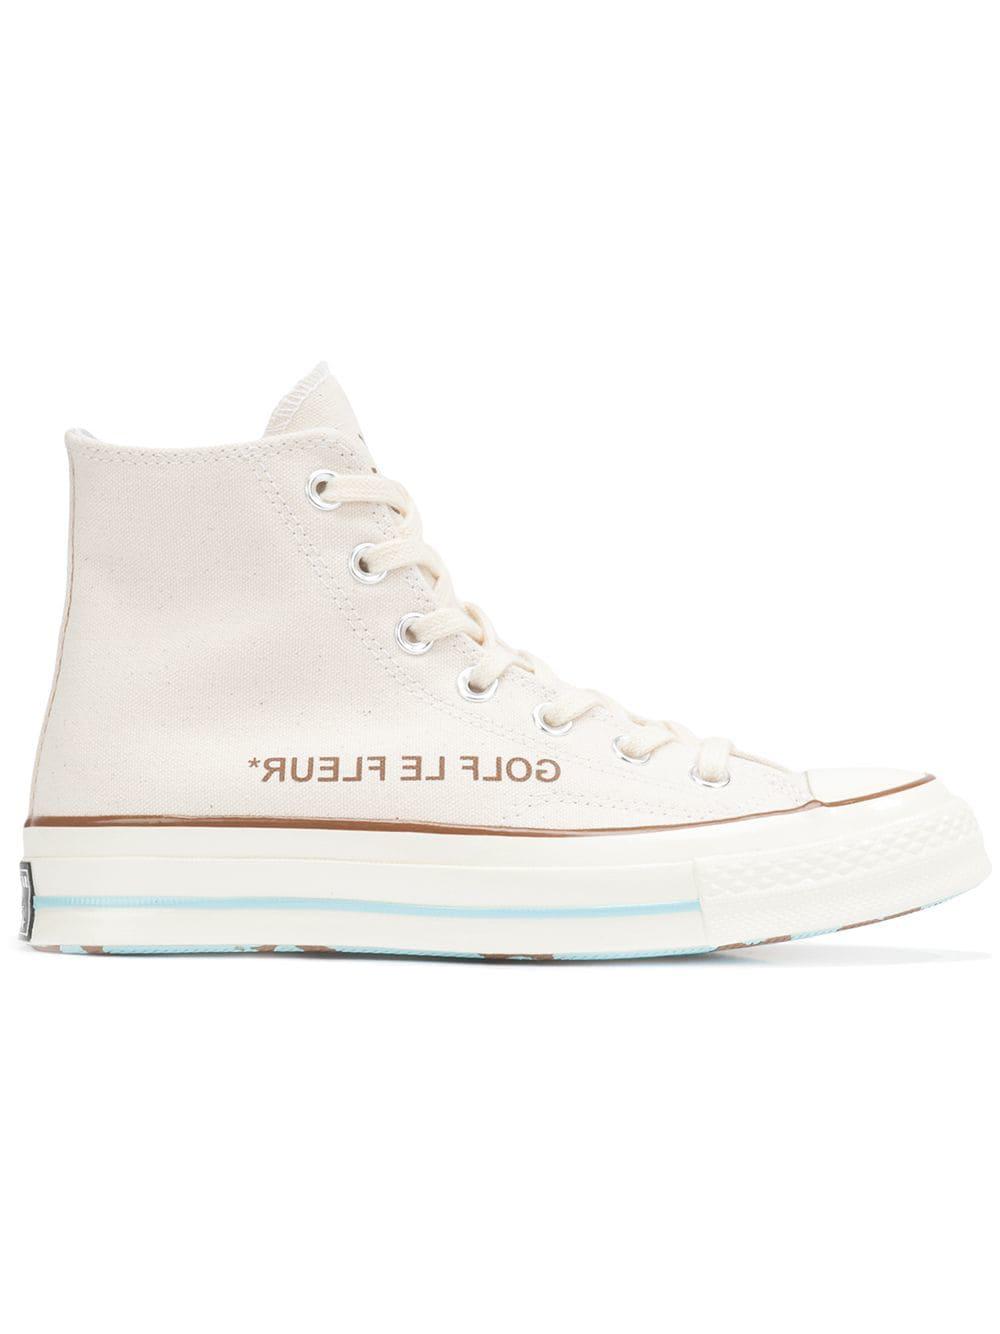 Converse Golf Le Fleur Chuck 70 High Top Sneakers - White